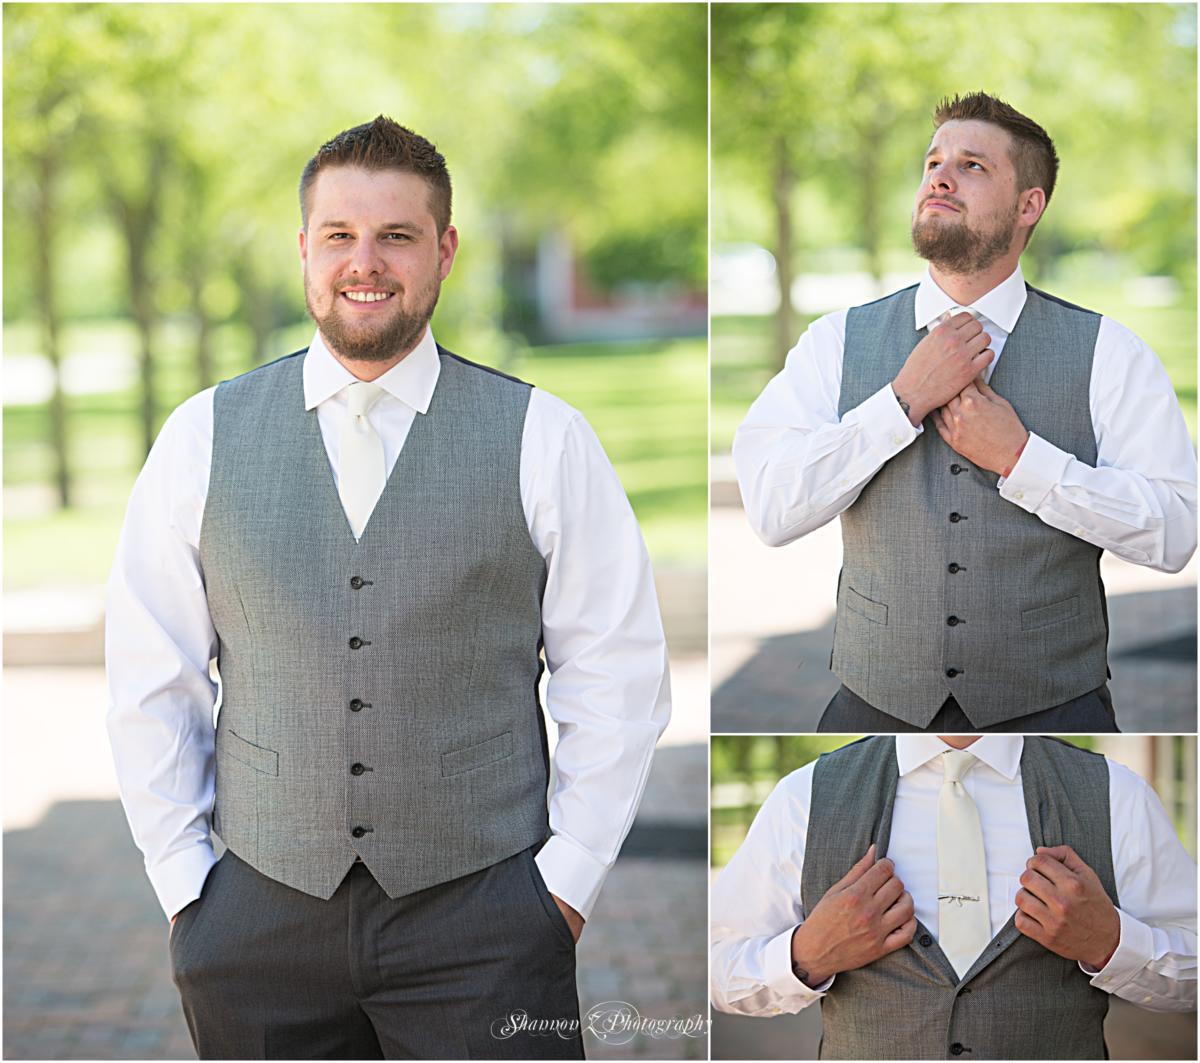 Byron-Colby-Barn-Wedding-Photos-8